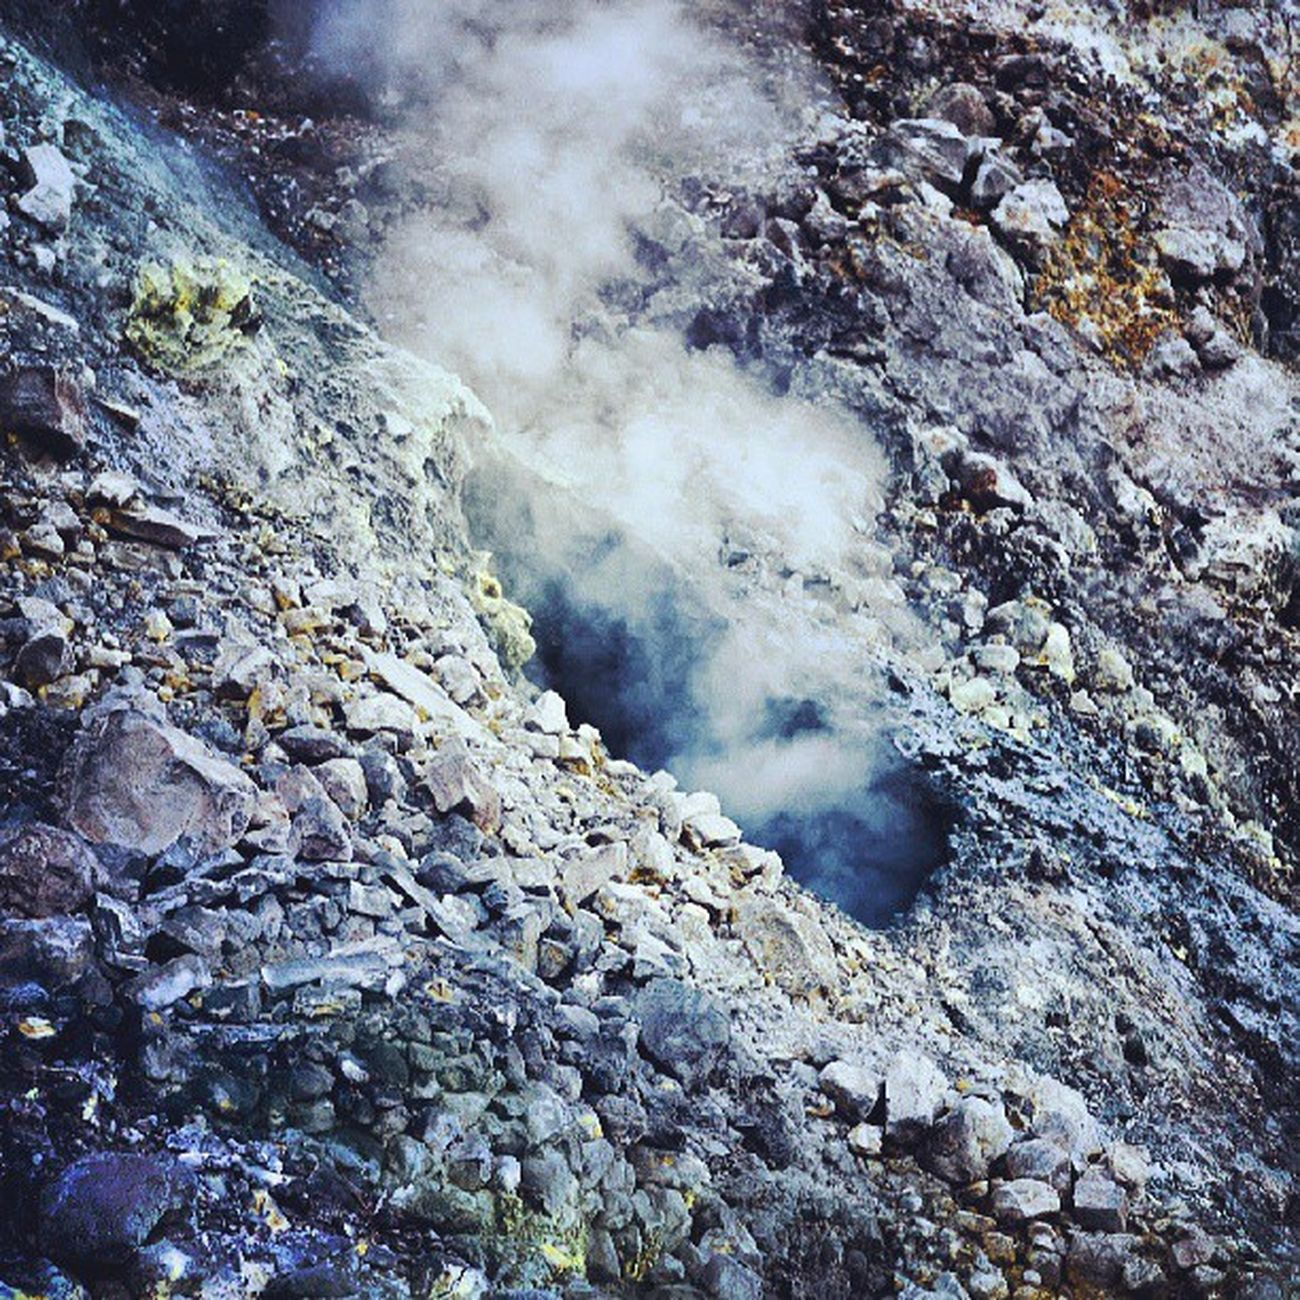 Crystalized Sulfid Macro Mytravelgram mystic travelingram travelphotography mountain vulcano asia Taipei taiwan nikond600 photooftheday picoftheday nature 陽明山 台灣 台北 nationalpark